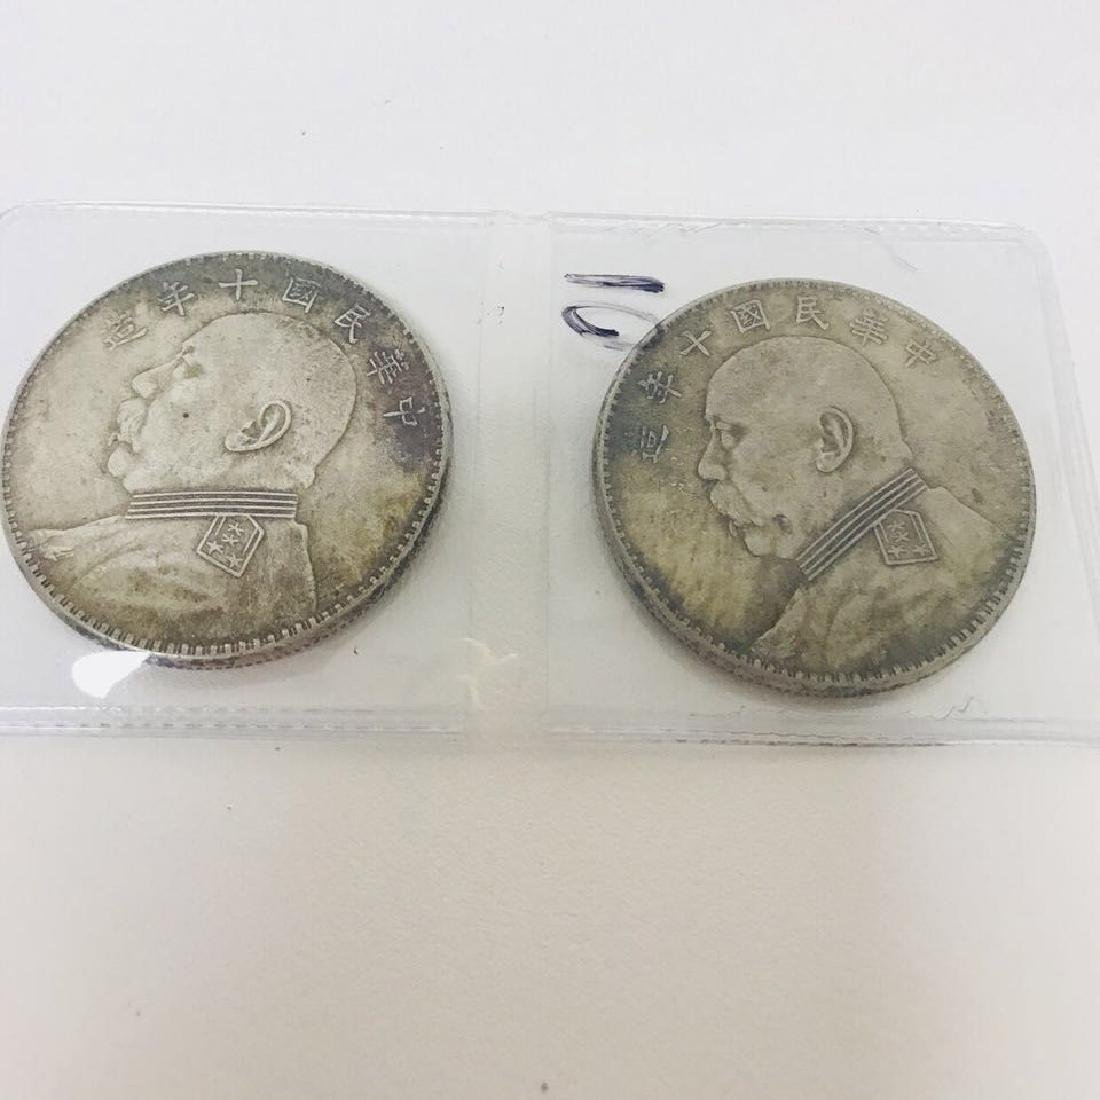 Pair of Big Head Yuan Silver Coins